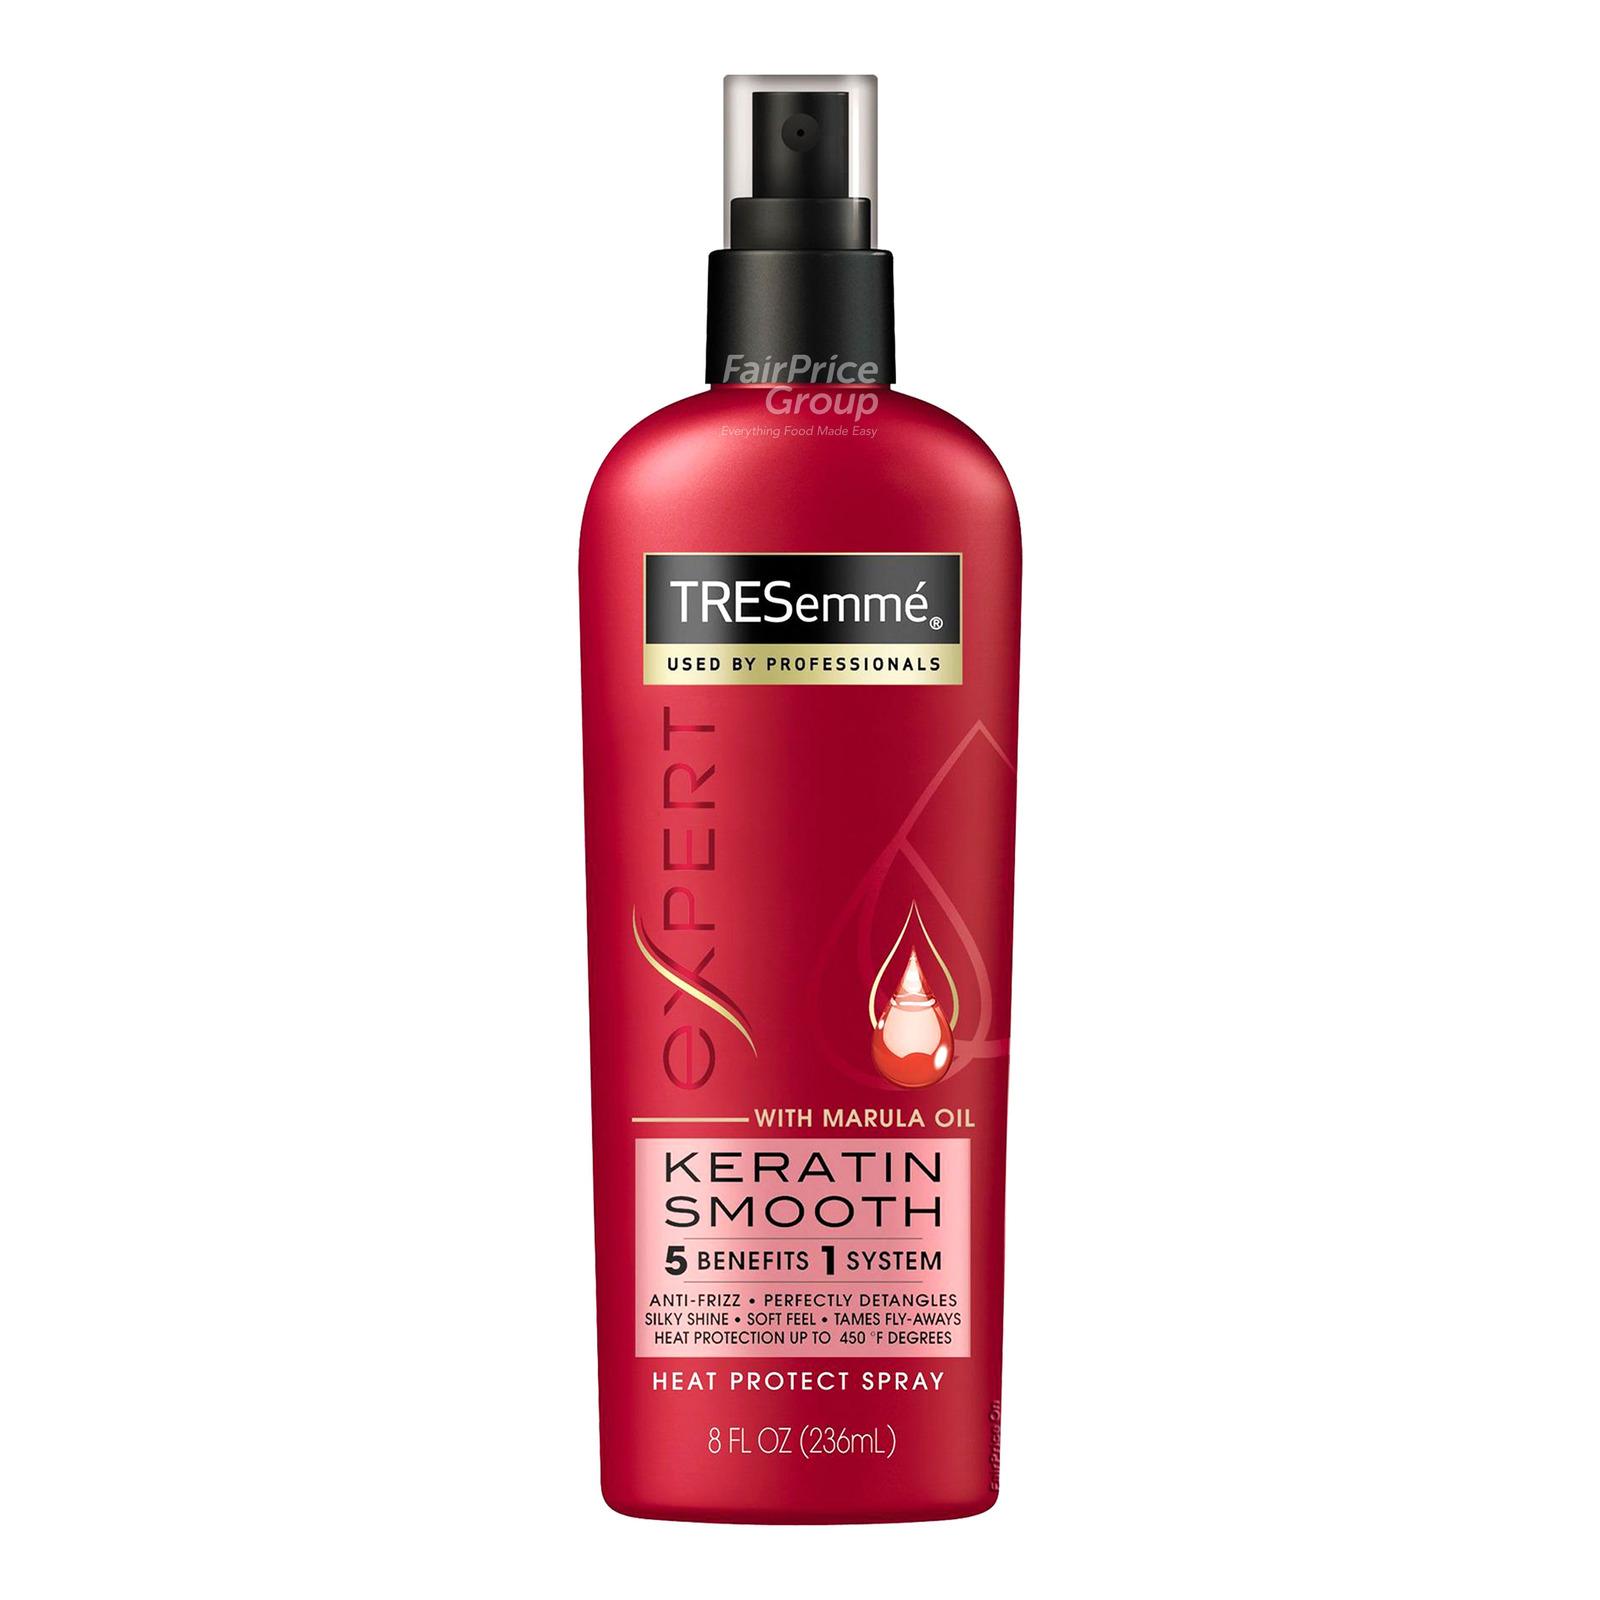 TRESemme Expert Heat Protect Spray - Keratin Smooth